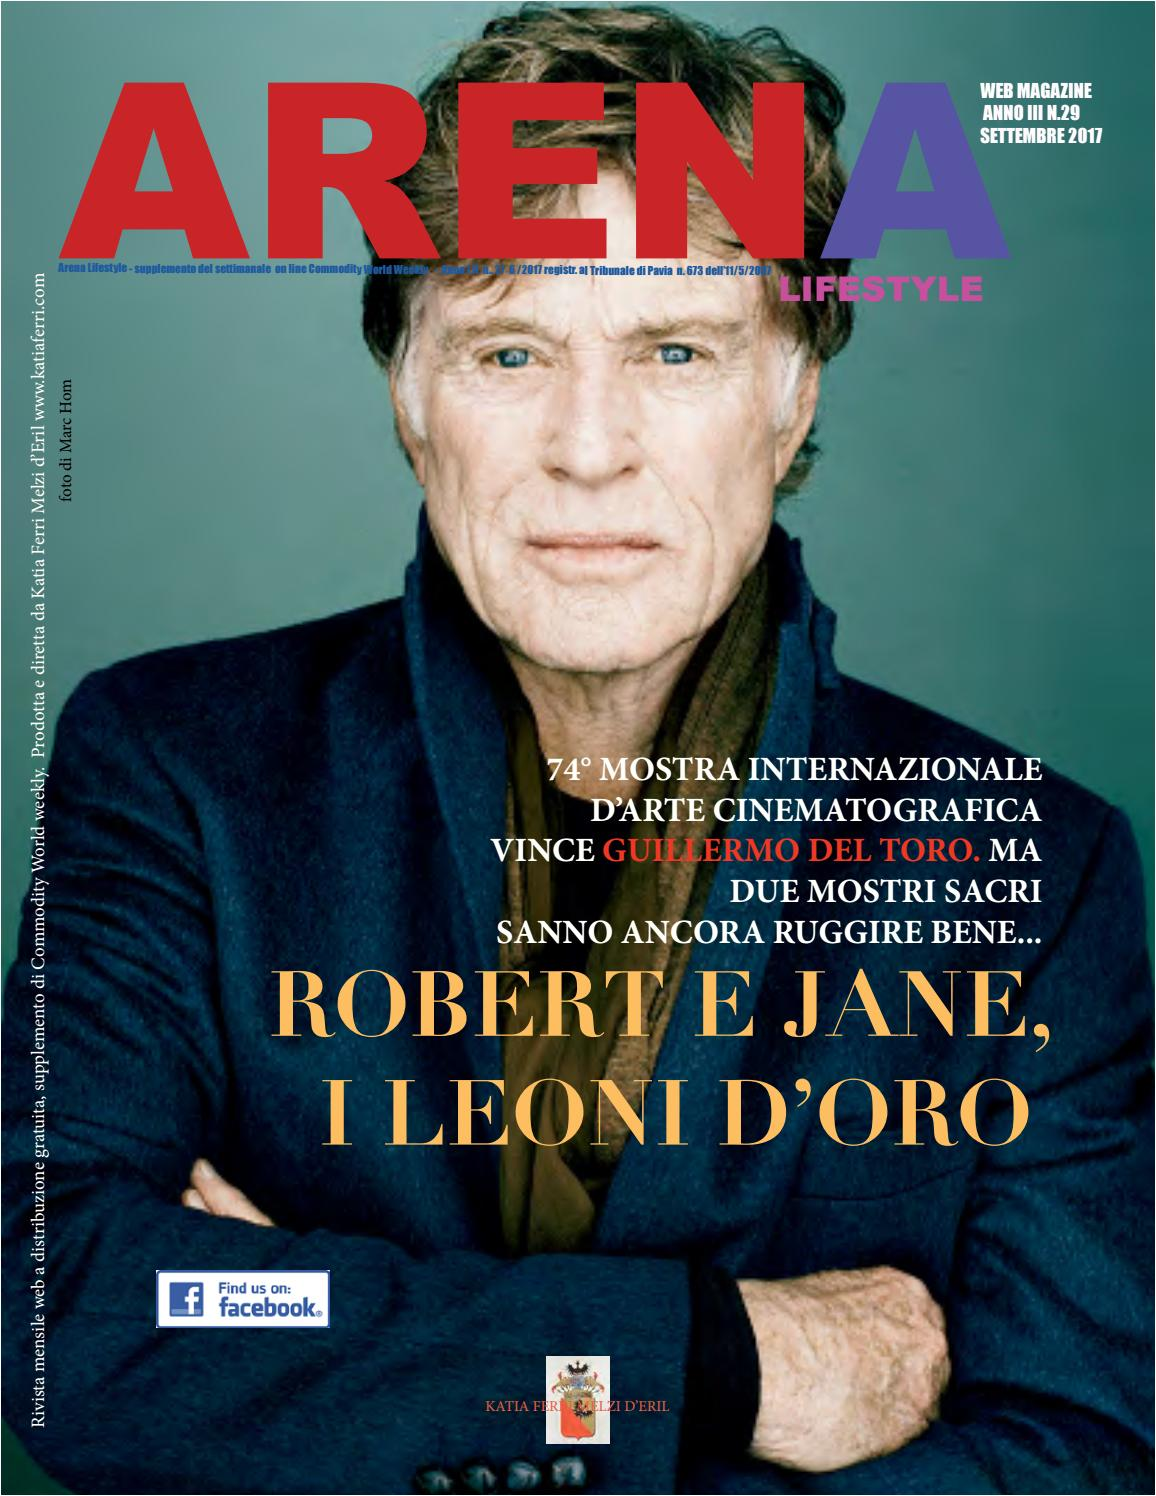 Arena lifestyle 09 2017 by katia Ferri Melzi d Eril - issuu cac0495dbef